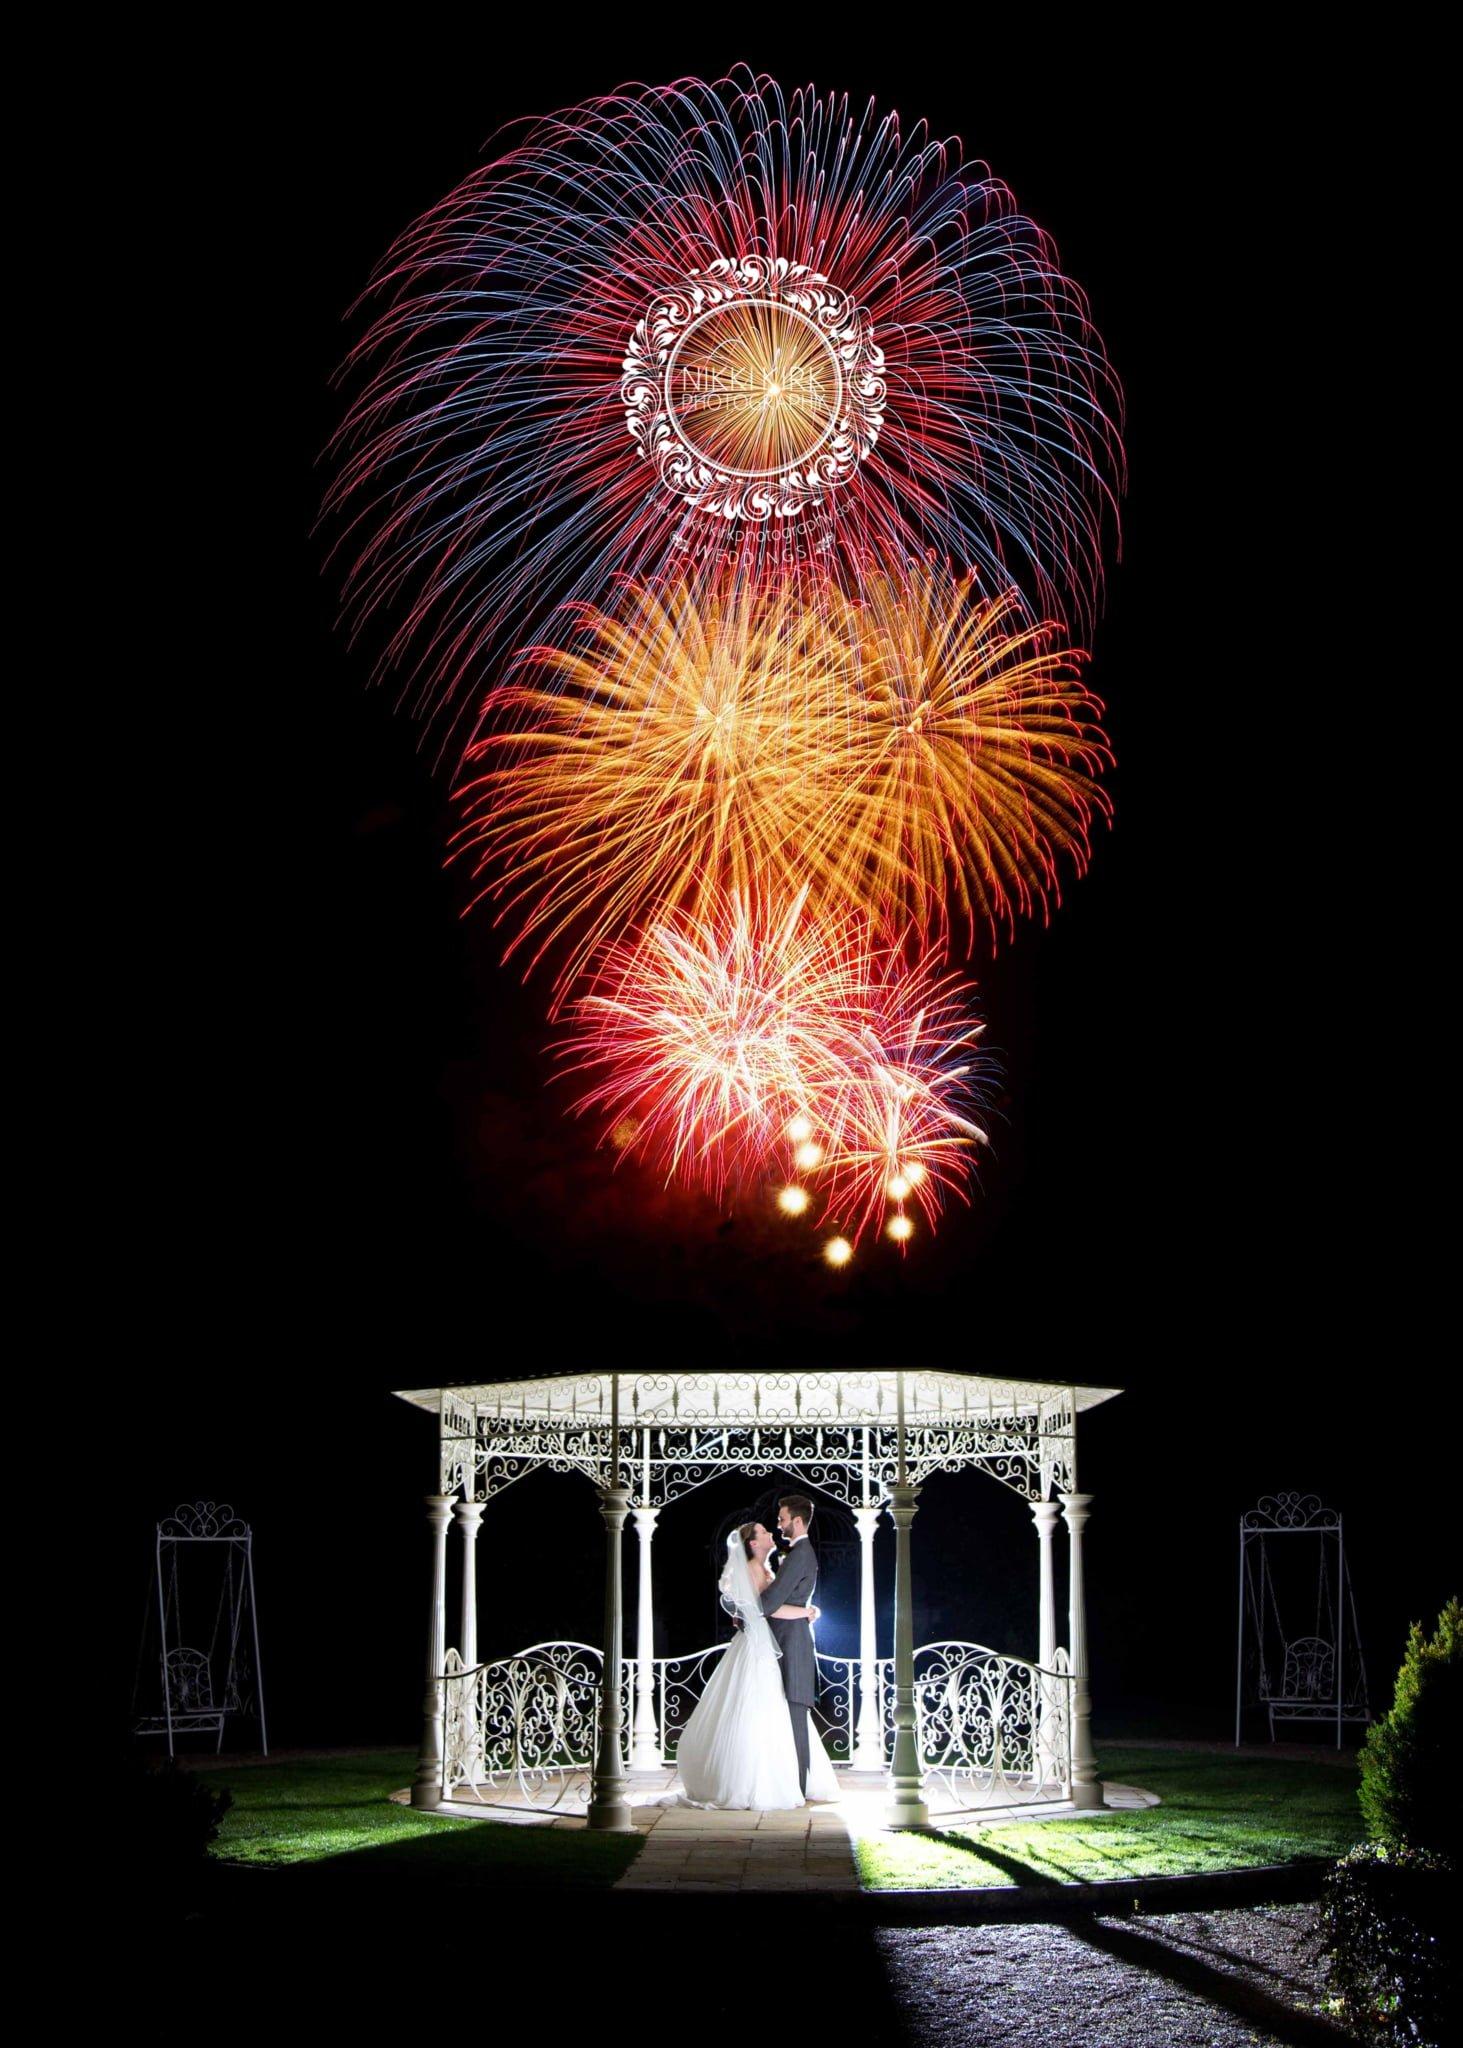 Winter-wedding-manor-by-the-lake-fireworks-photographer-Nikki-Kirk